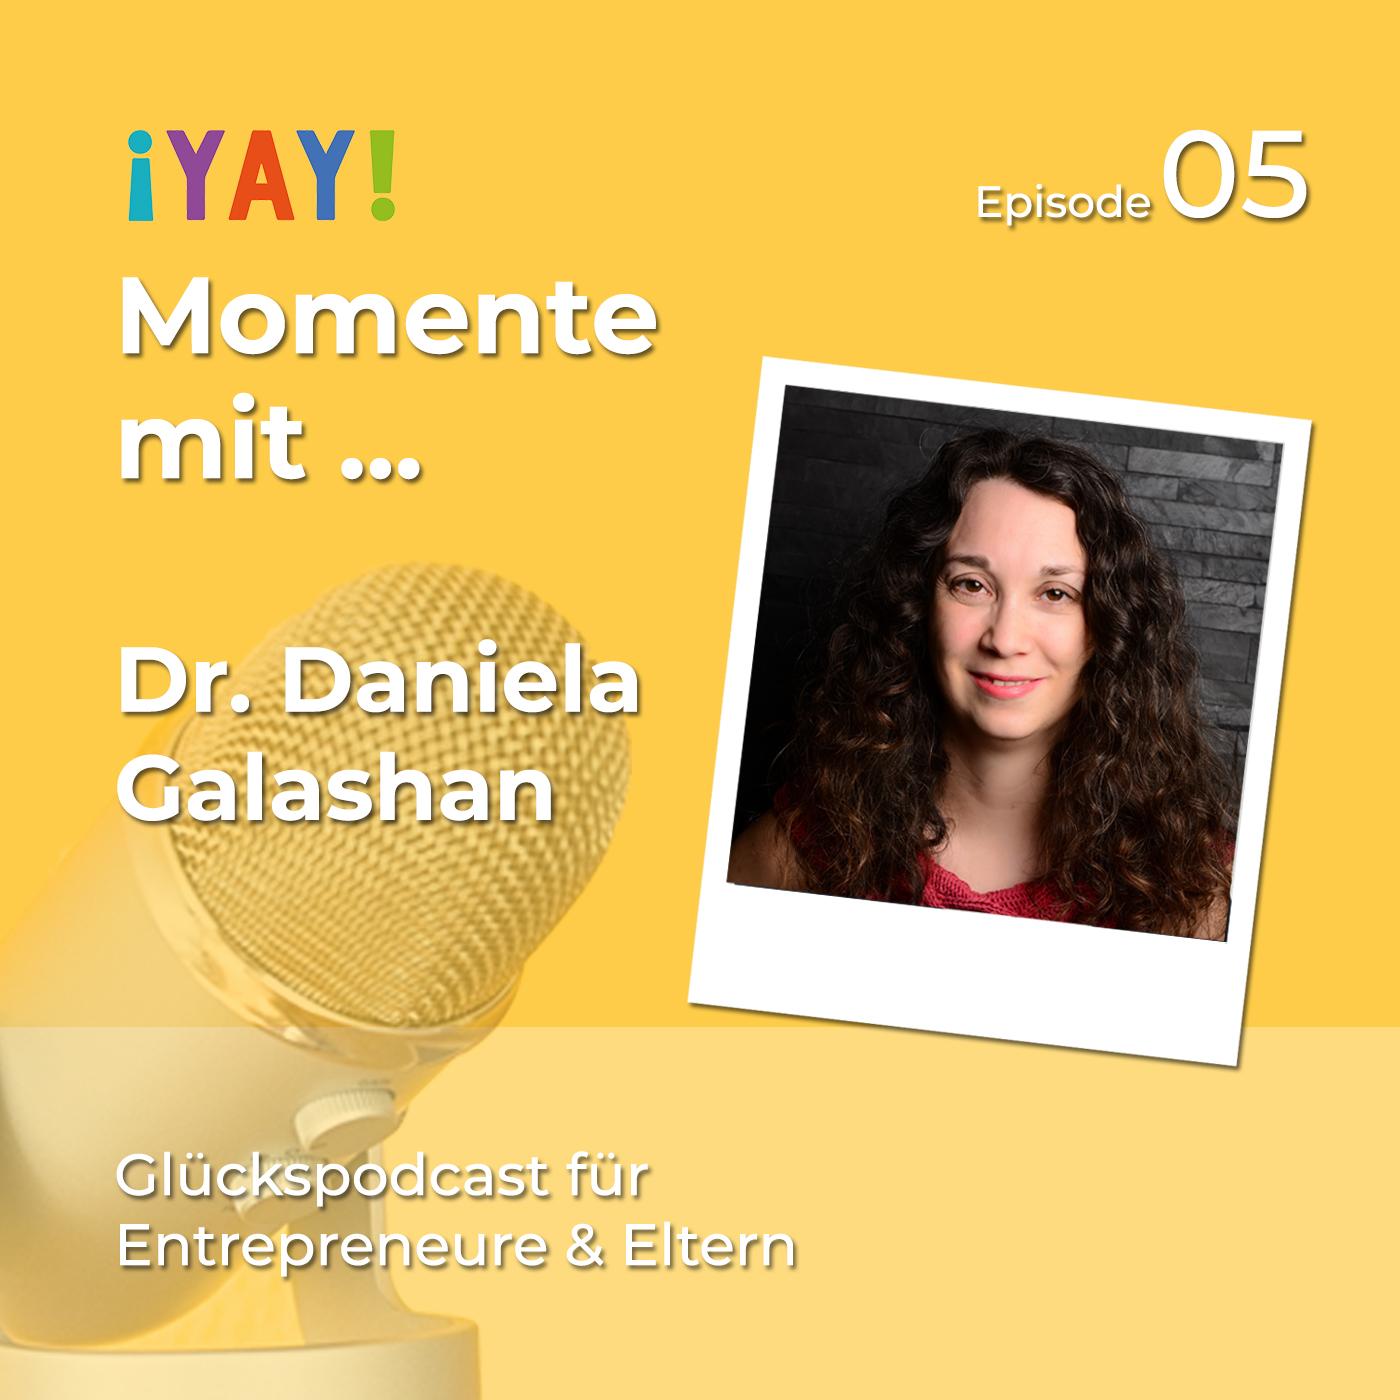 Episode 05: YAY-Momente mit ... Dr. Daniela Galashan